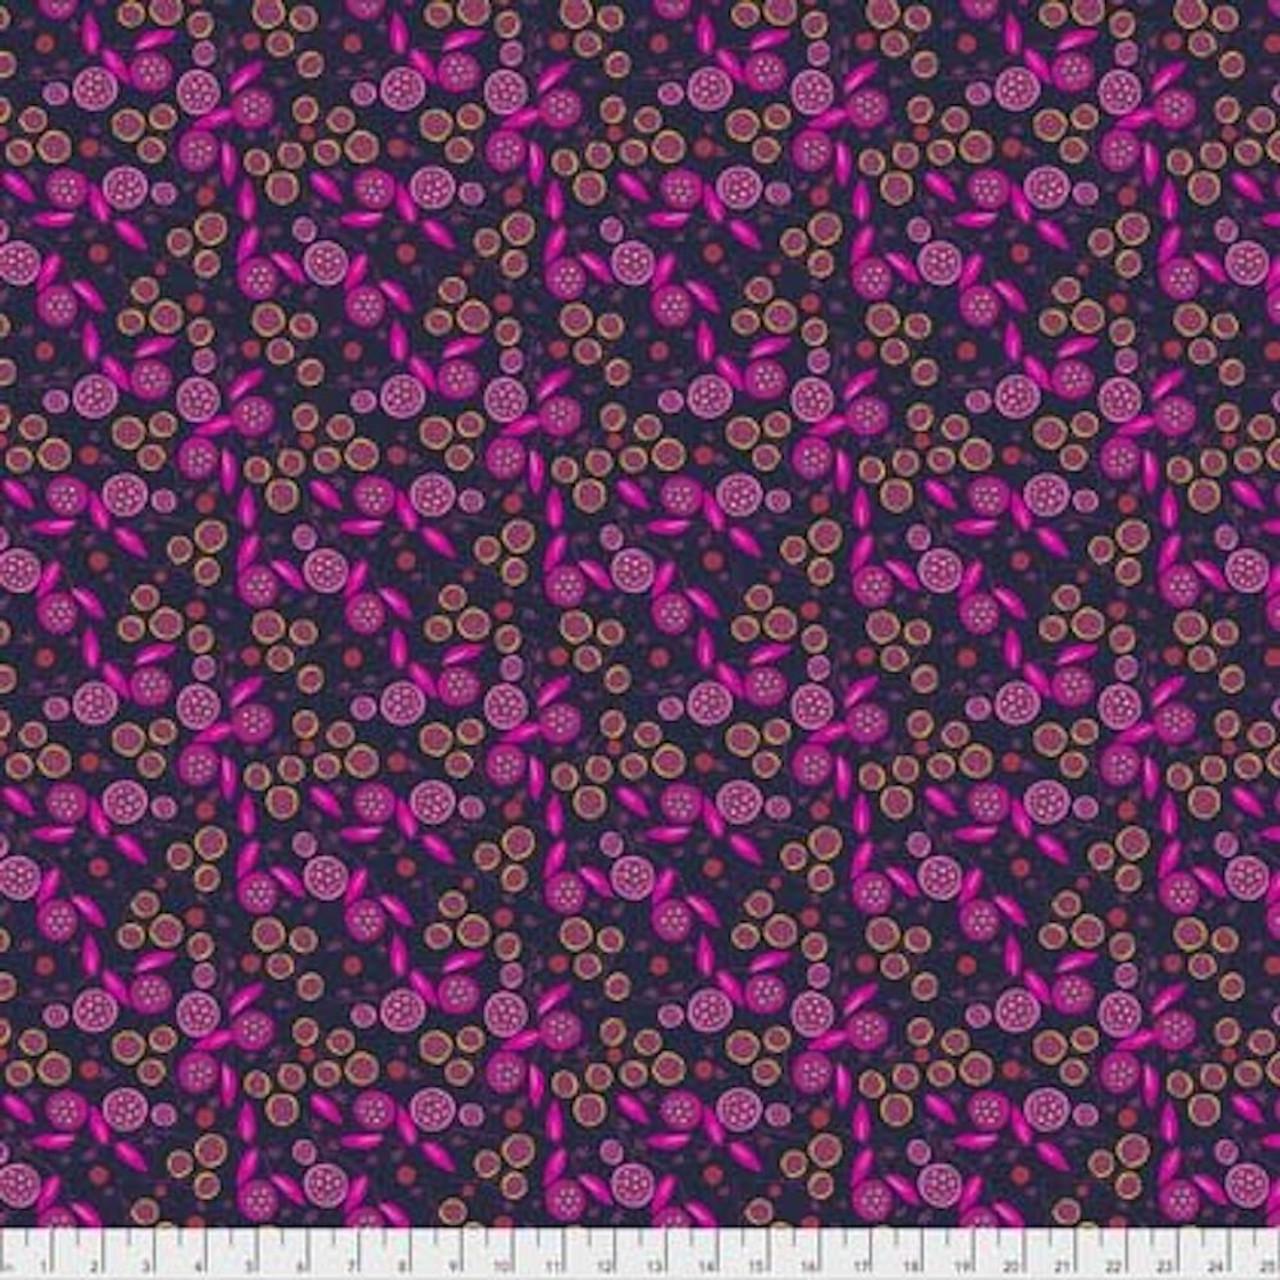 Shannon Newlin Garden Dreams PWSN0014 Very Berry Dark Cotton Fabric By Yd